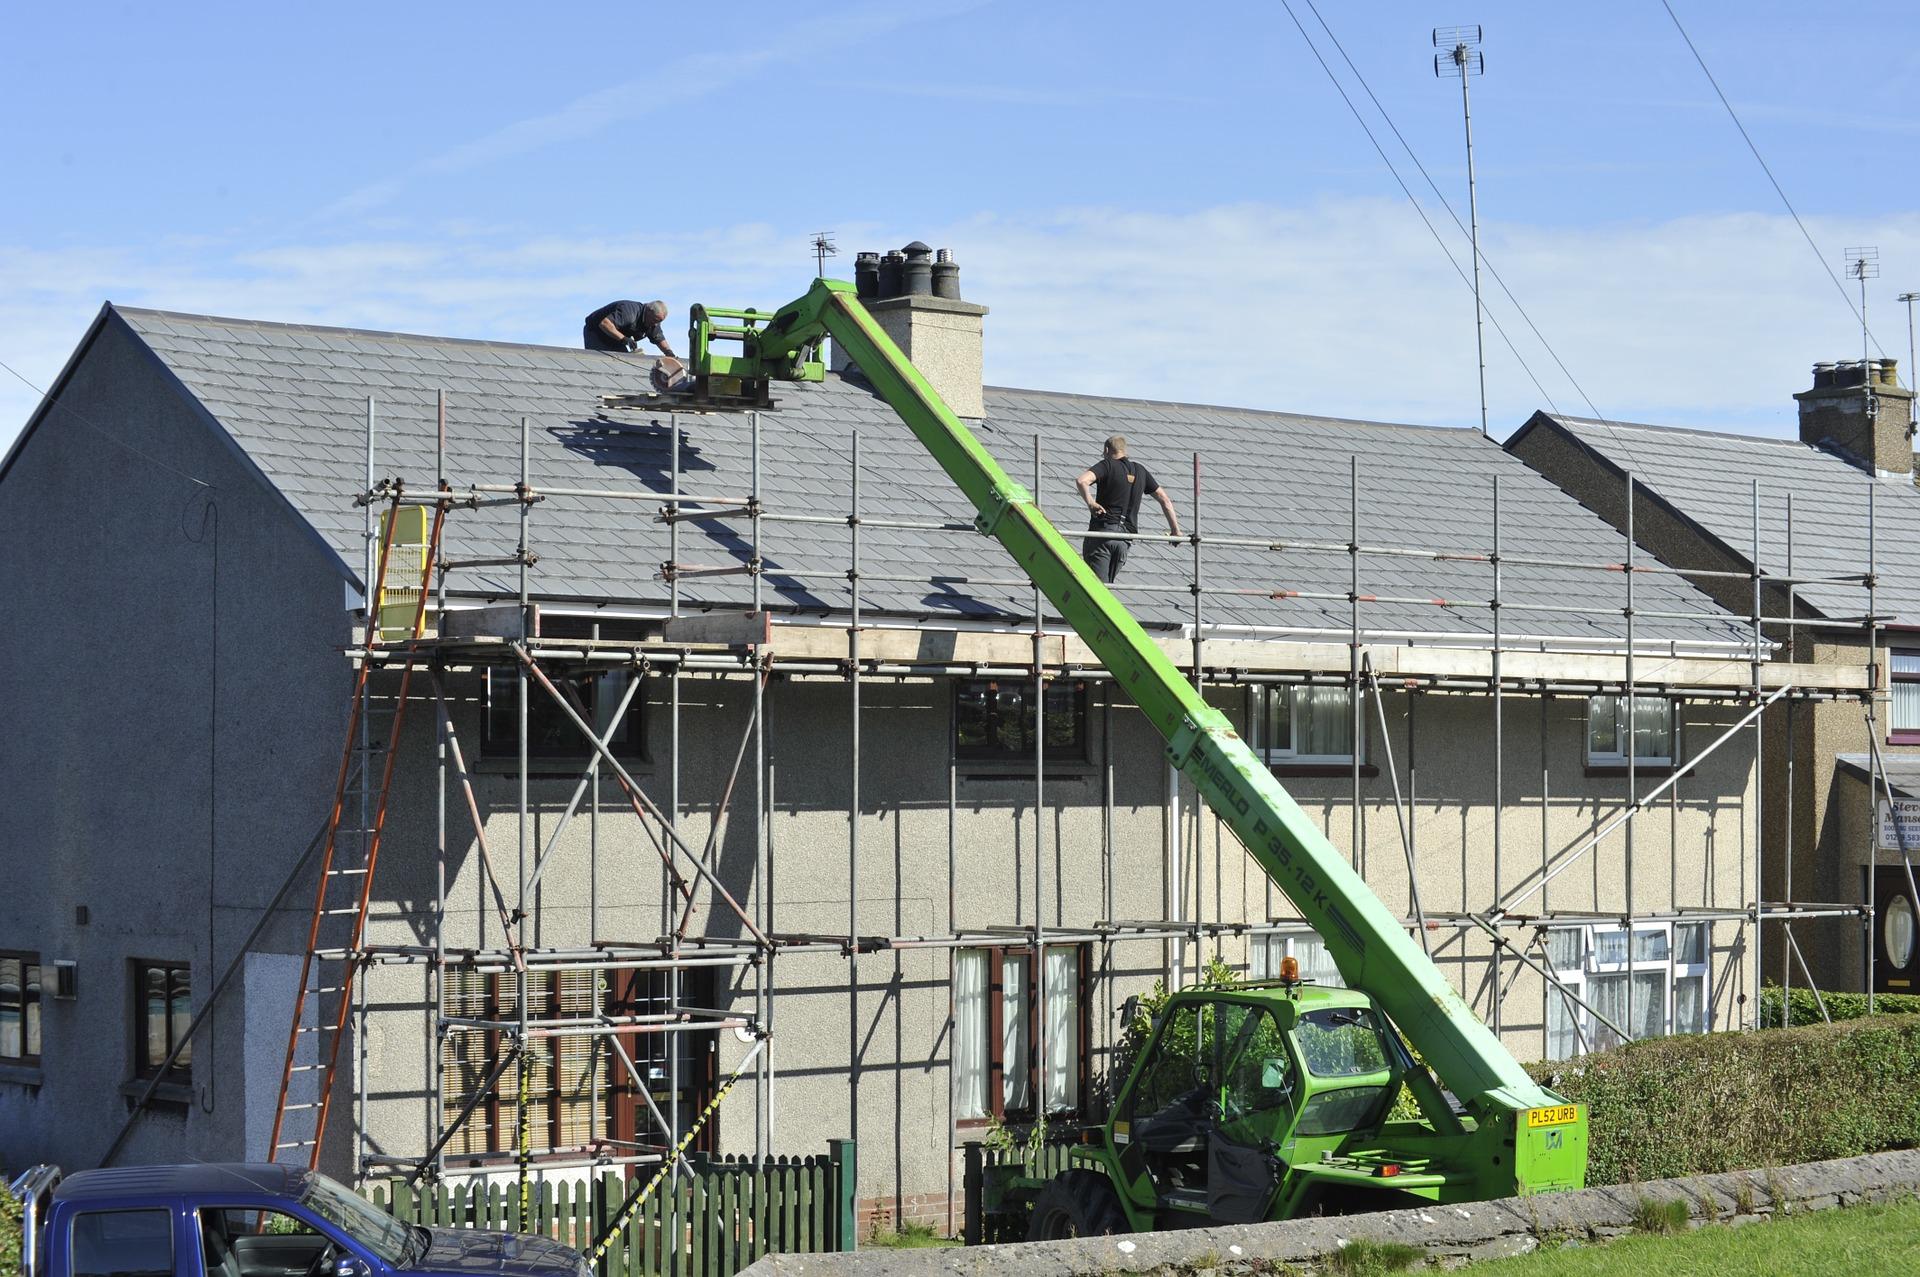 USDA Offering Grants to Help Repair Housing in Rural Communities — Apply Now!